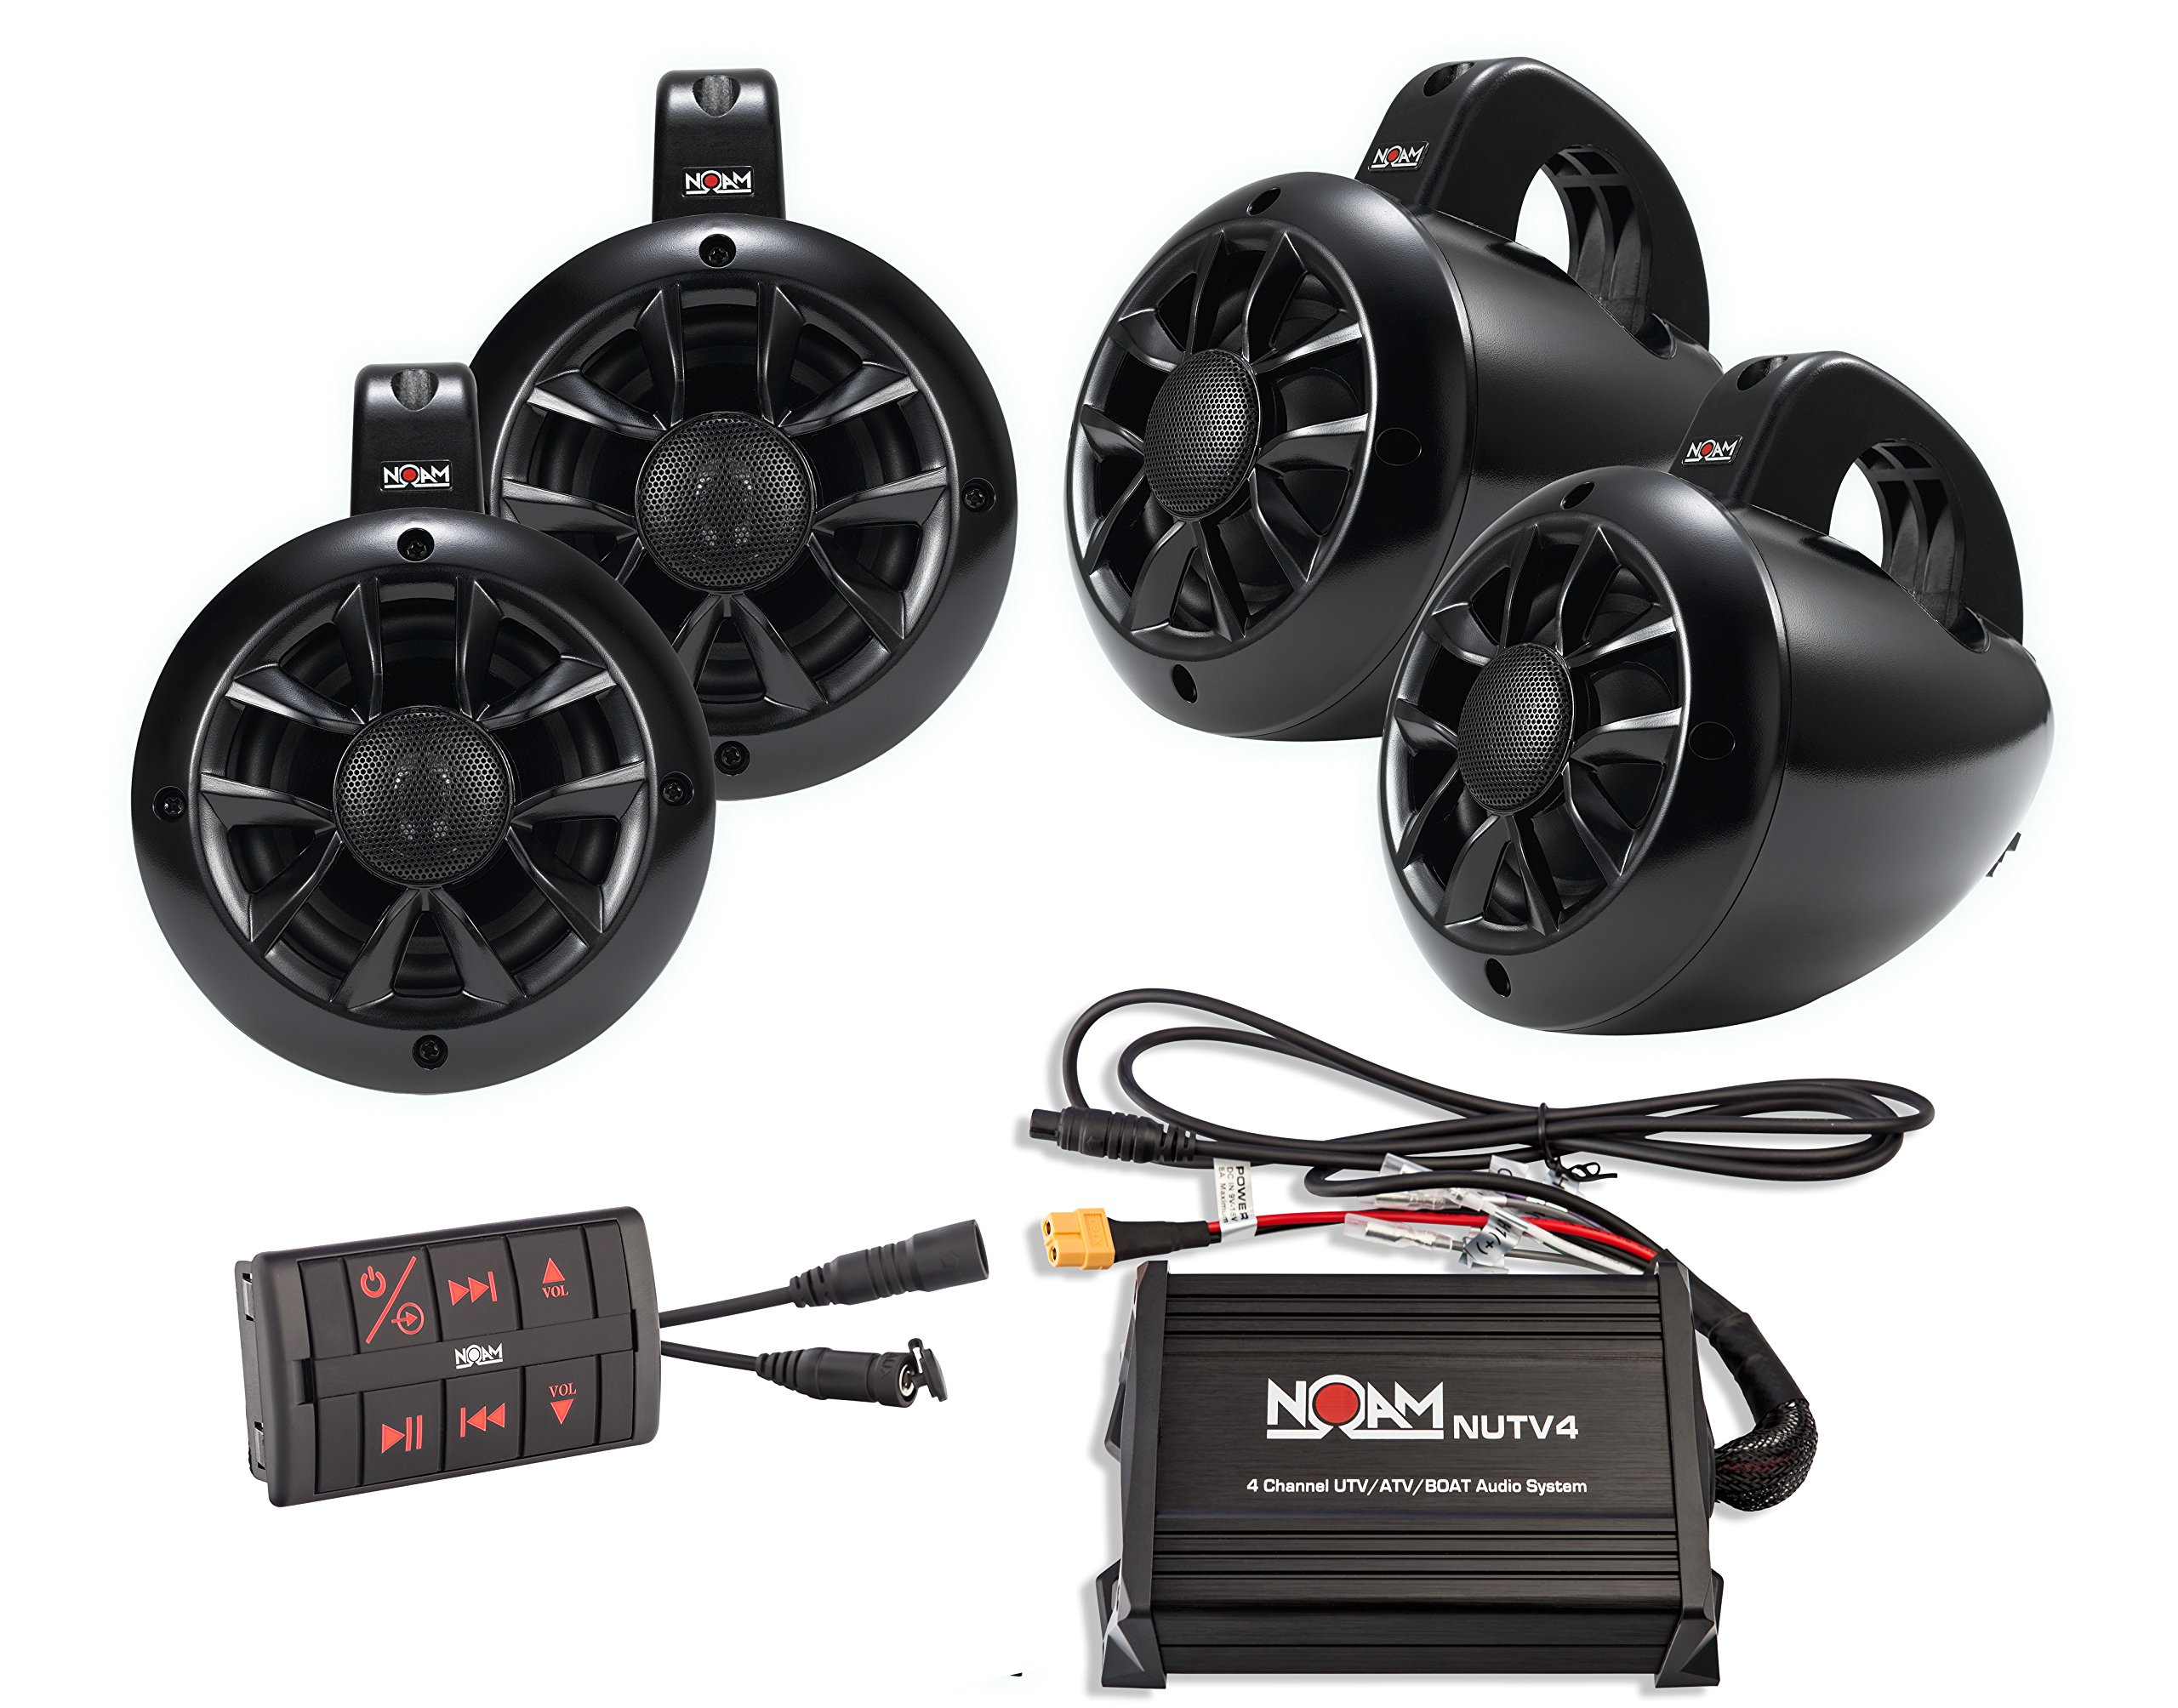 NOAM NUTV4 QUAD - 4 Channels Marine Bluetooth ATV / Golf Cart / UTV Speakers Stereo System by NOAM